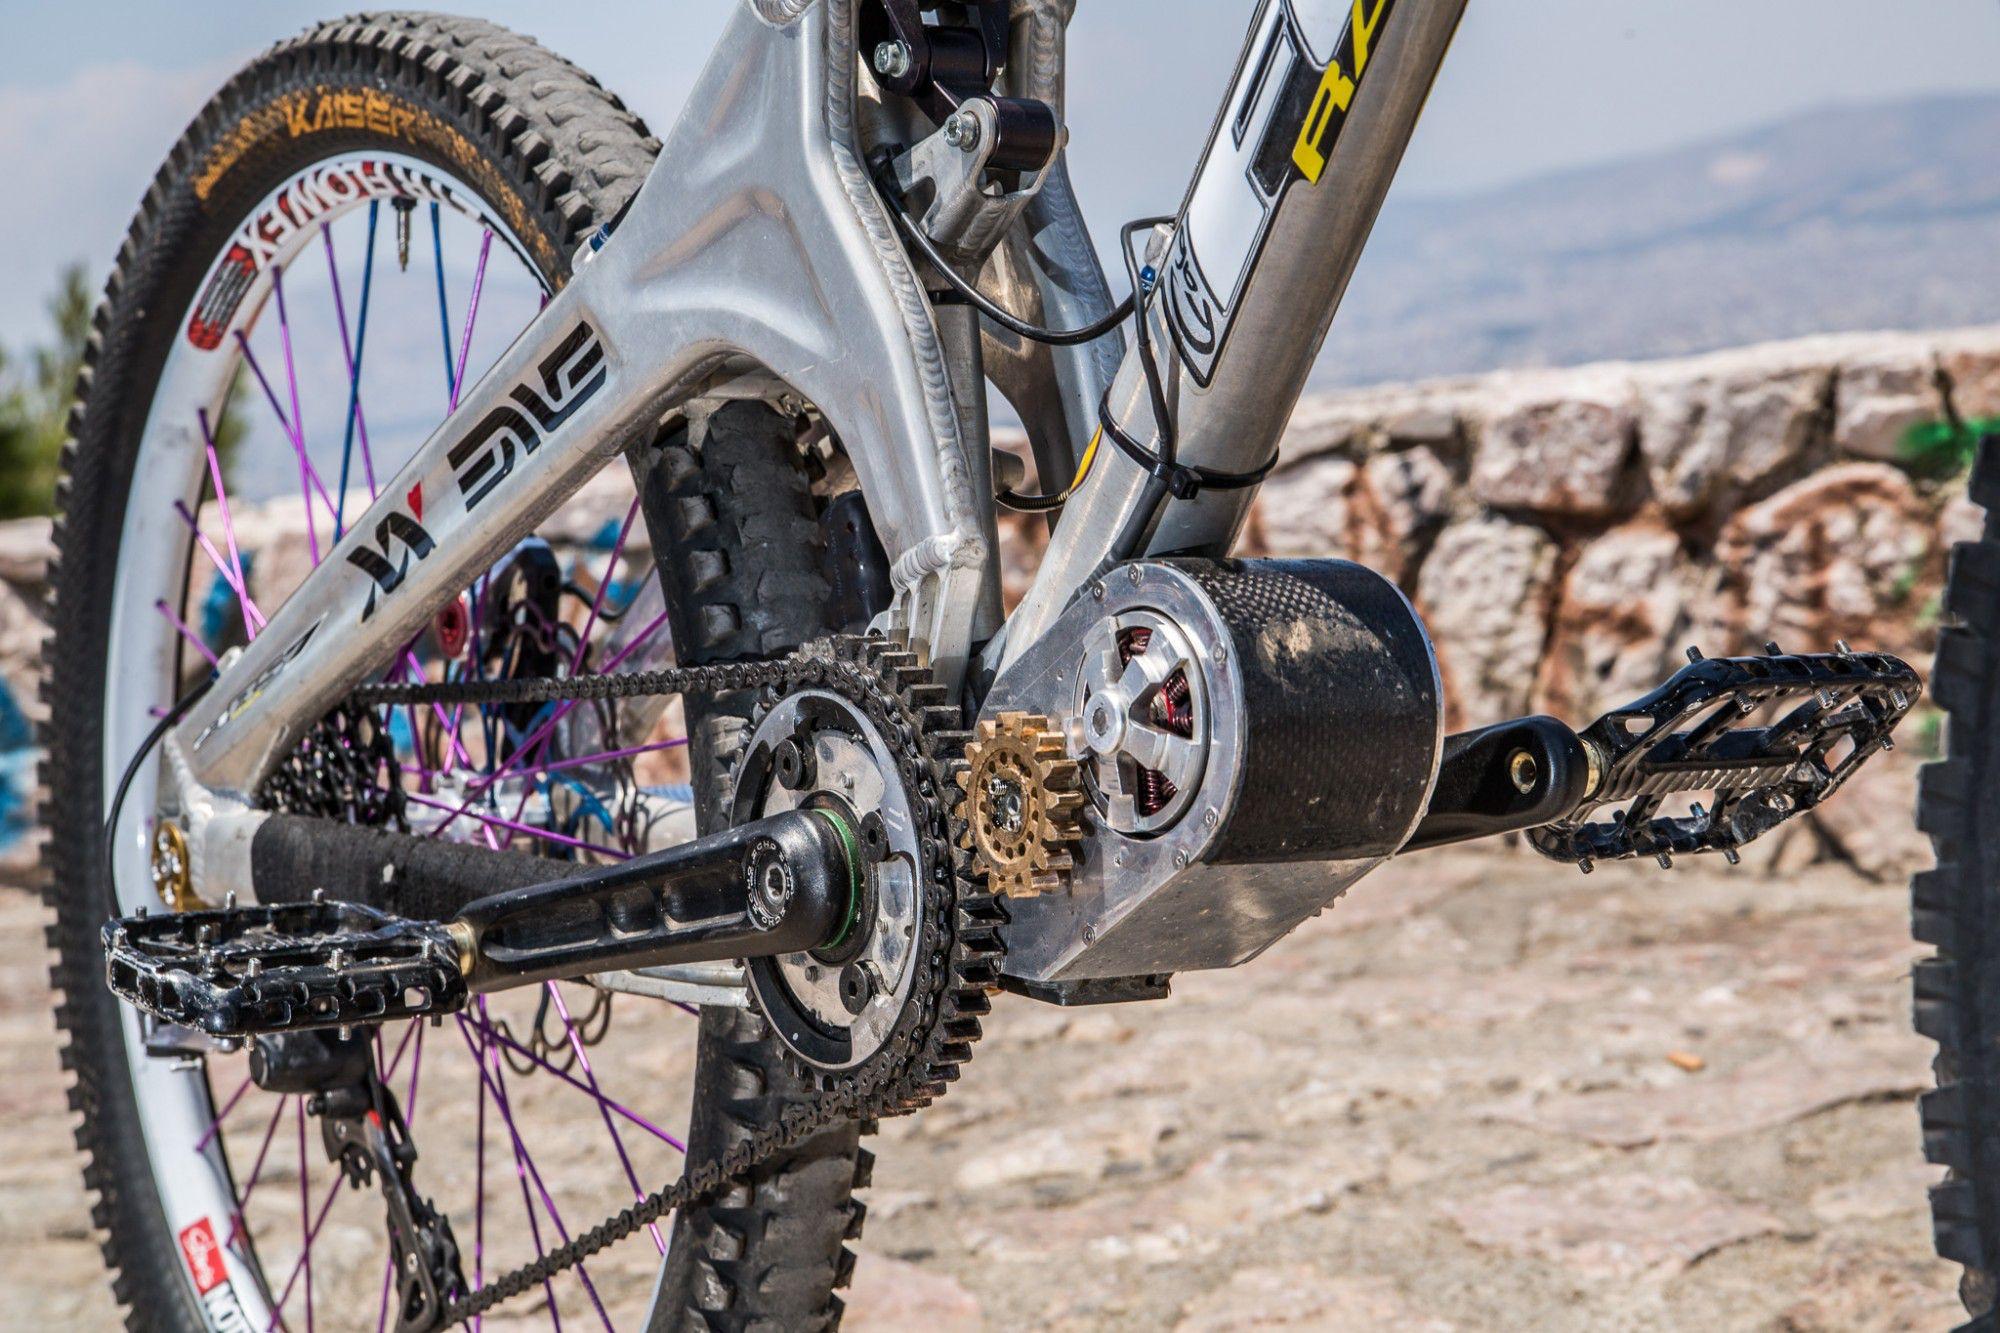 paradox kinetics electric bicycle 1500 watt hermes motor. Black Bedroom Furniture Sets. Home Design Ideas